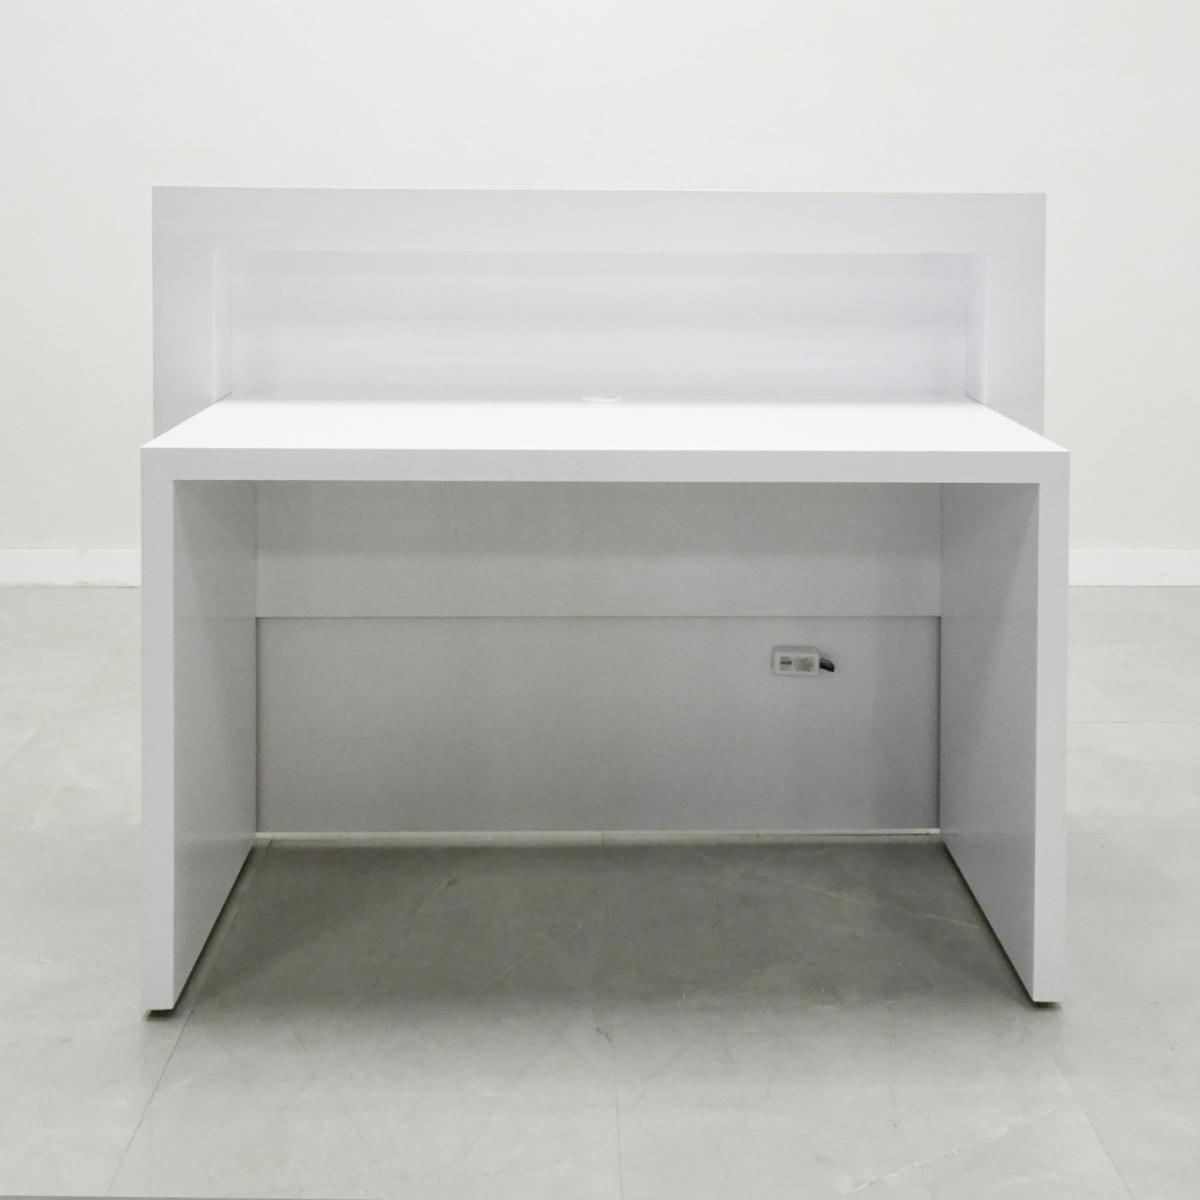 60 In. New York Reception Desk in White Gloss Laminate - Stock #100